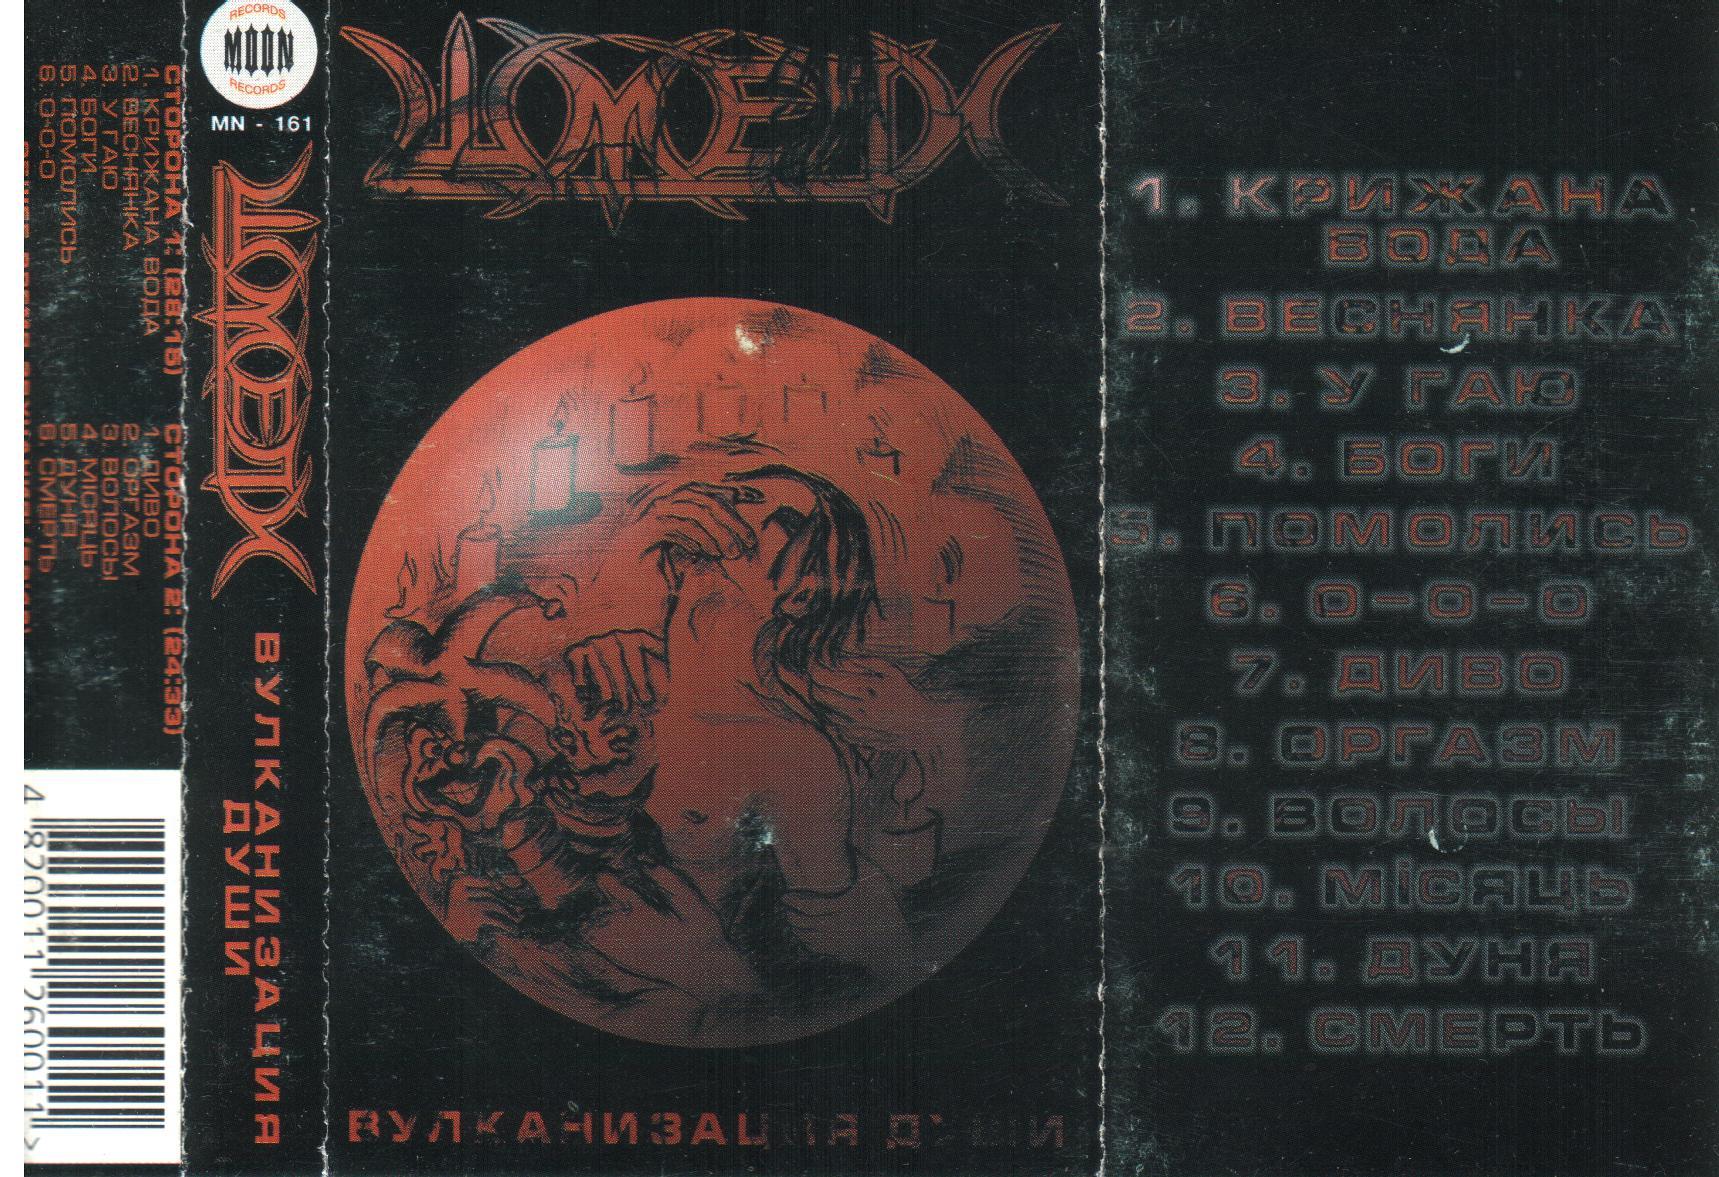 http://llimejib.ucoz.ru/pics/shm/cover/vdcover.jpg